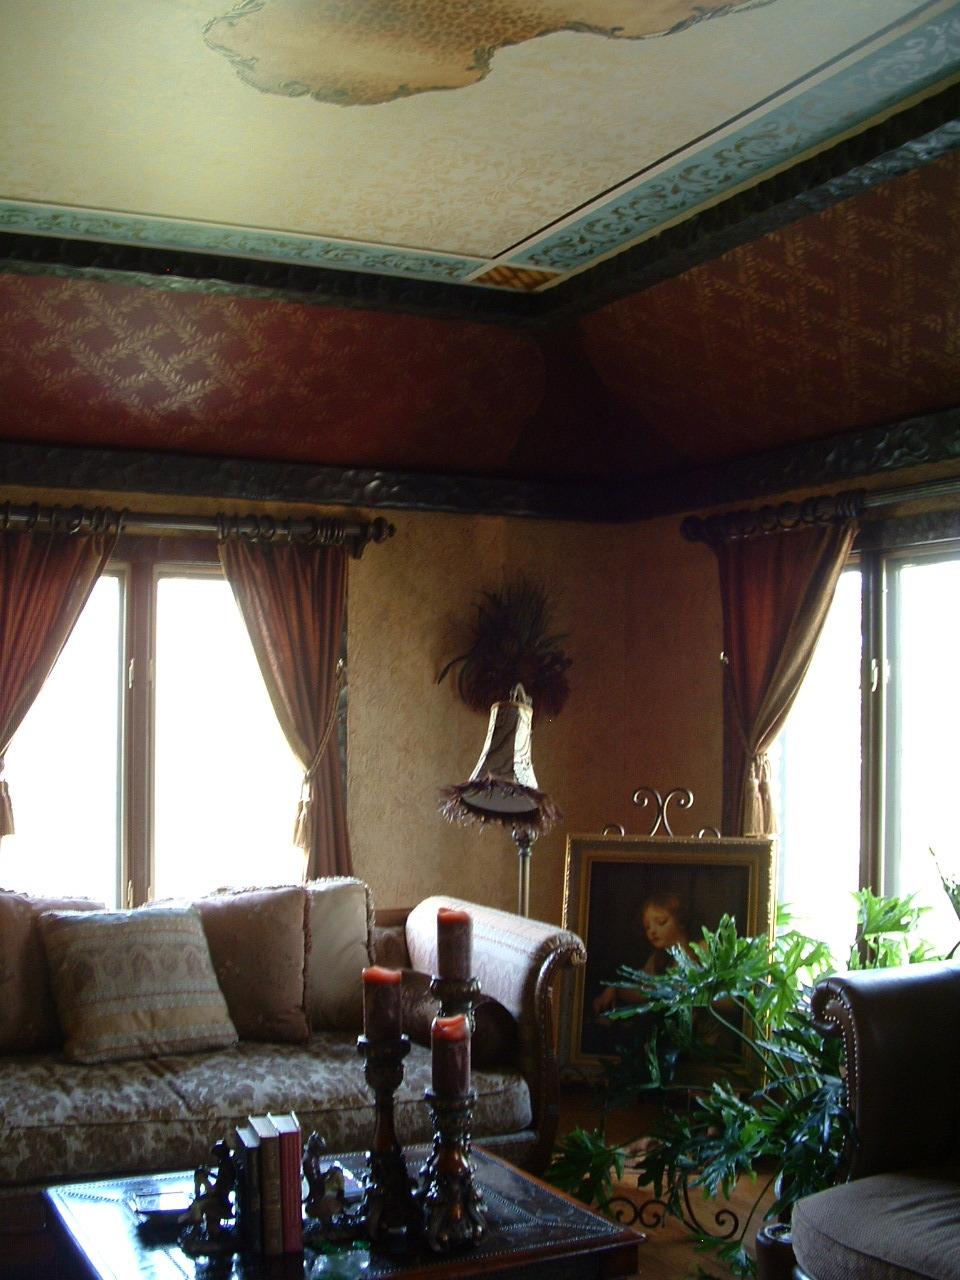 intricate-ceiling-patterns.JPG